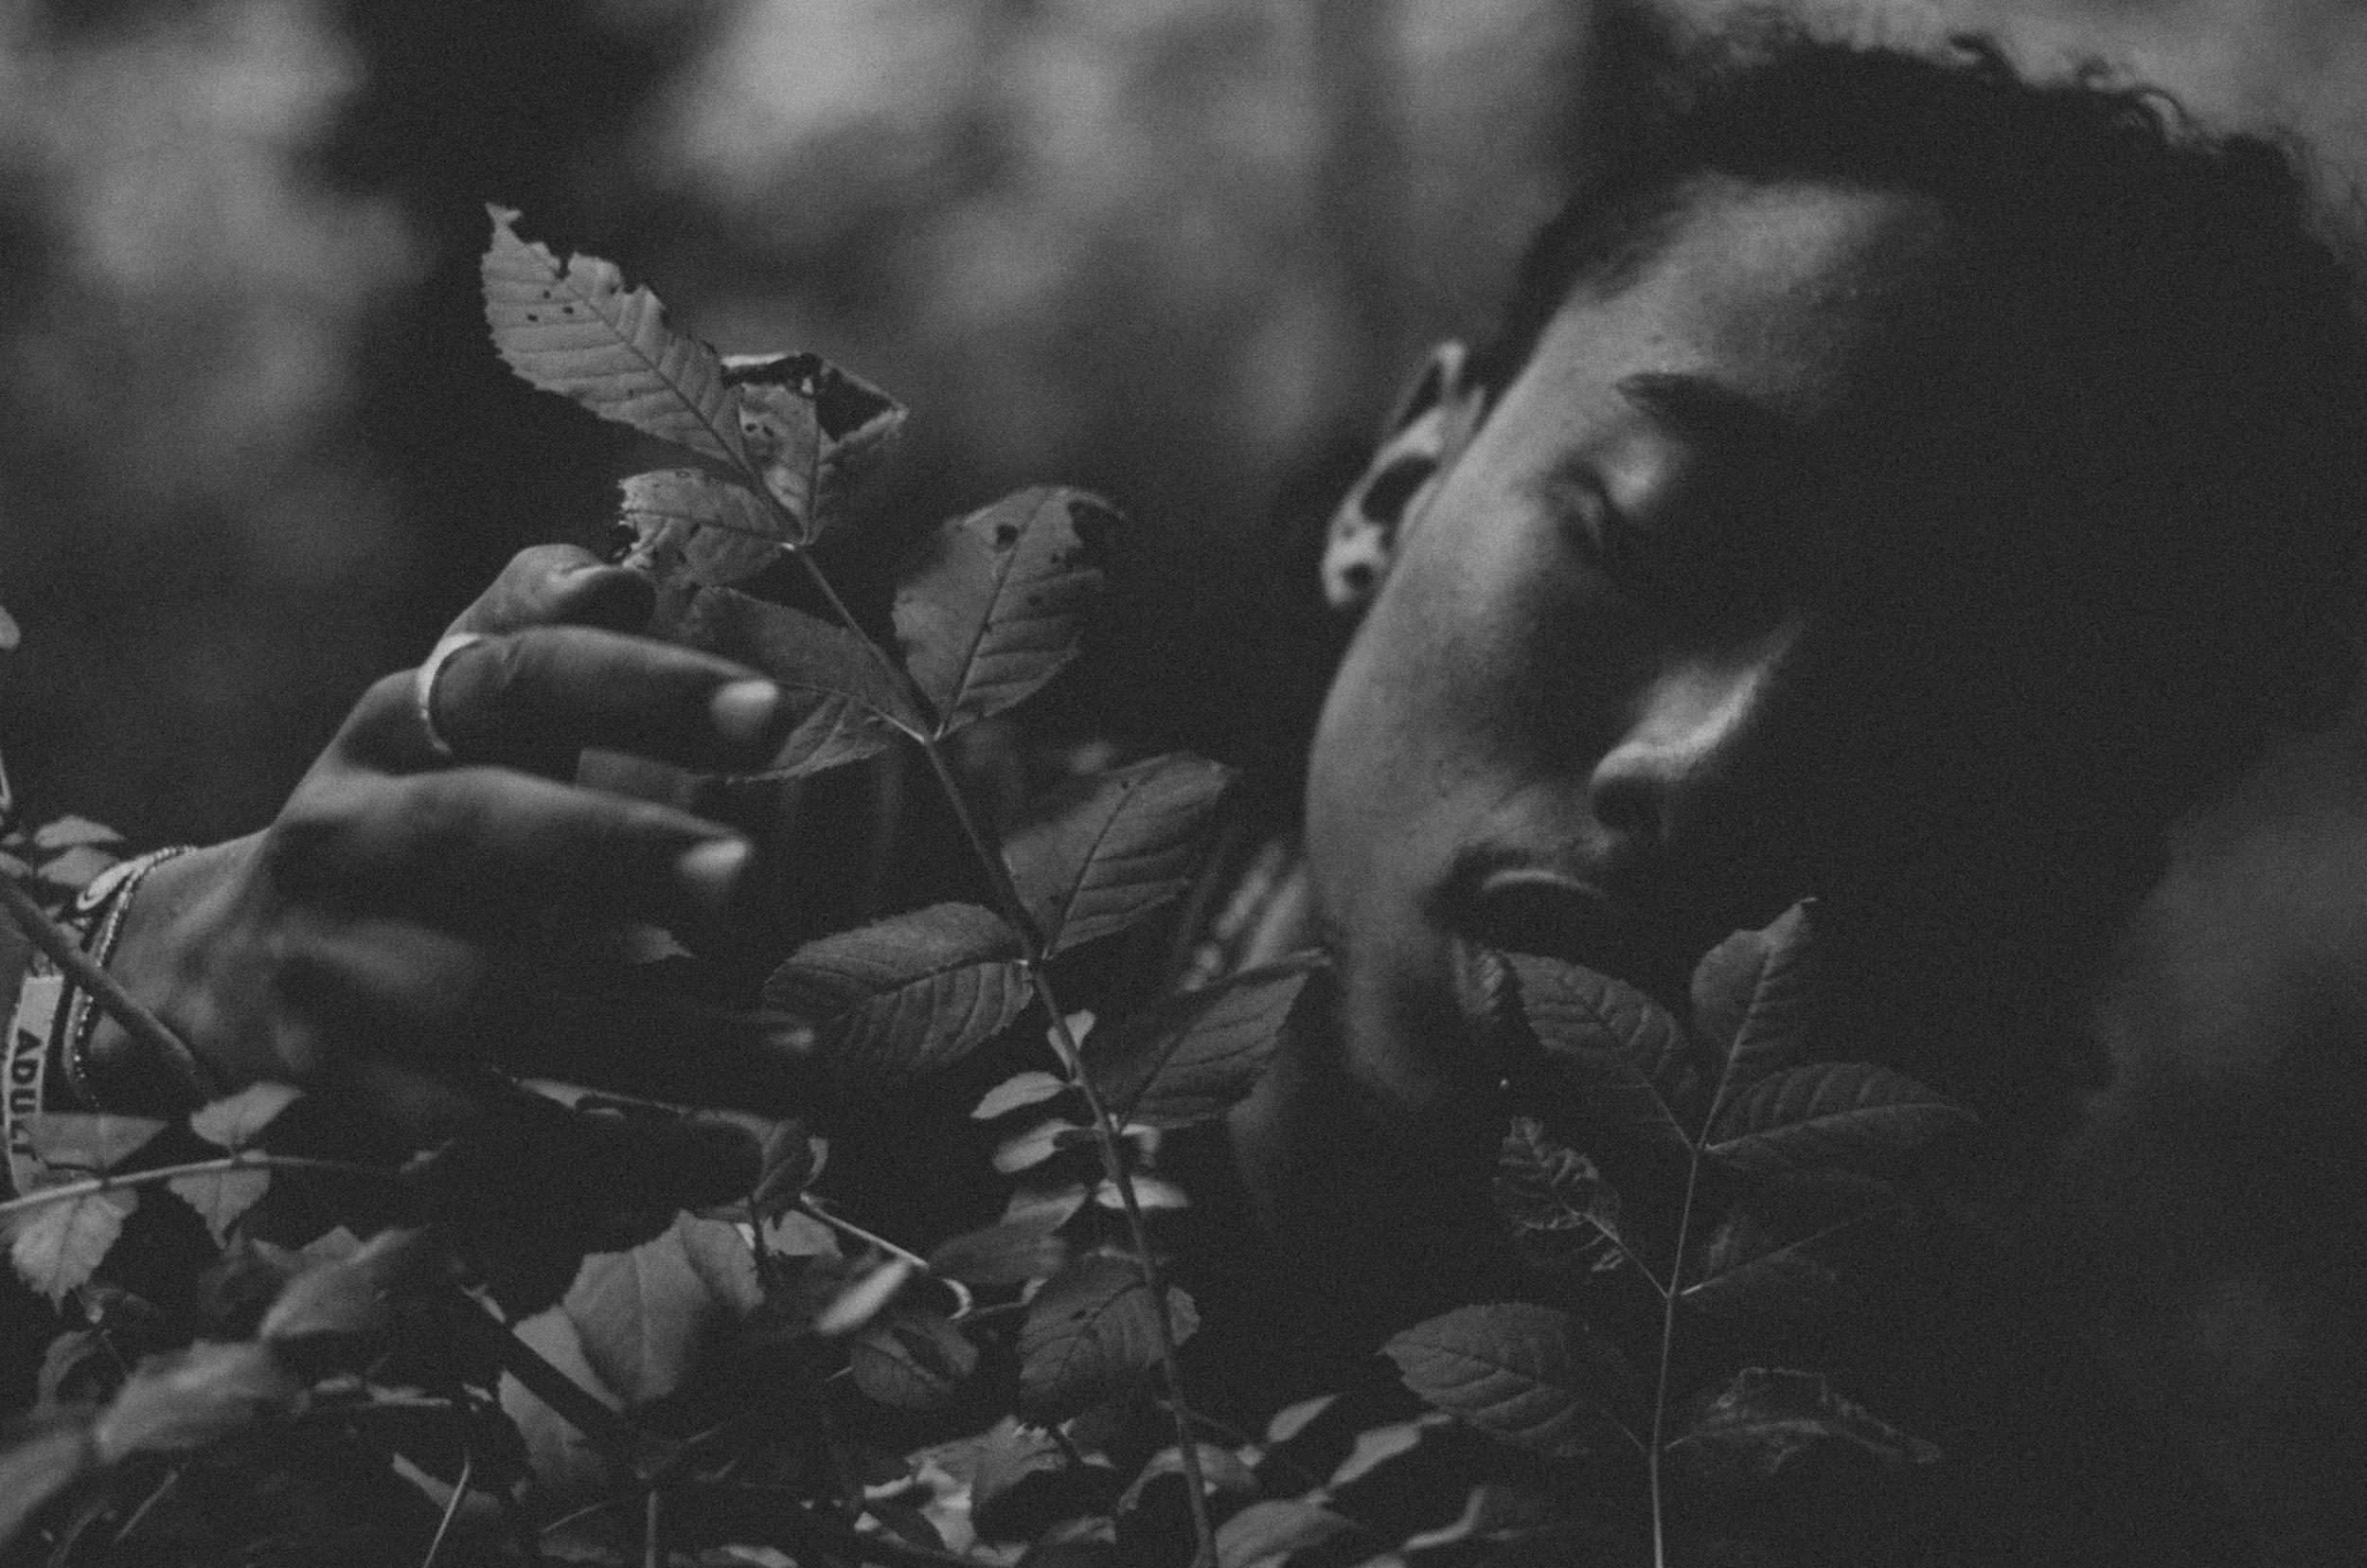 Muti-Portrait-Session-Aiste-Saulyte-Photography-22-9-15-94.jpg